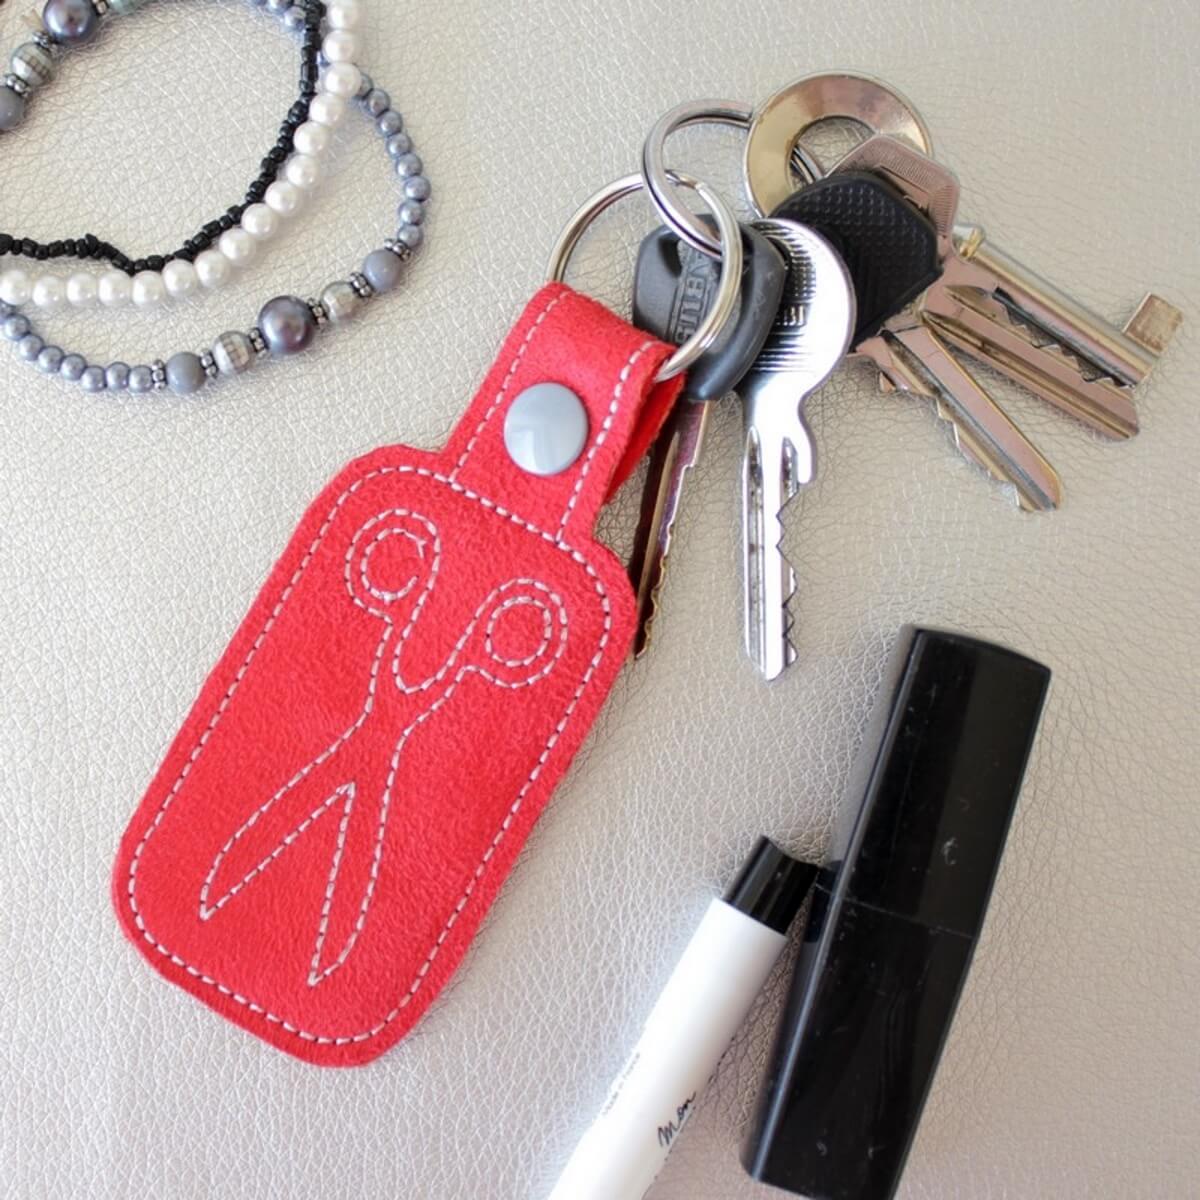 Schlüsselanhänger Little Scissors (ITH Stickdatei)